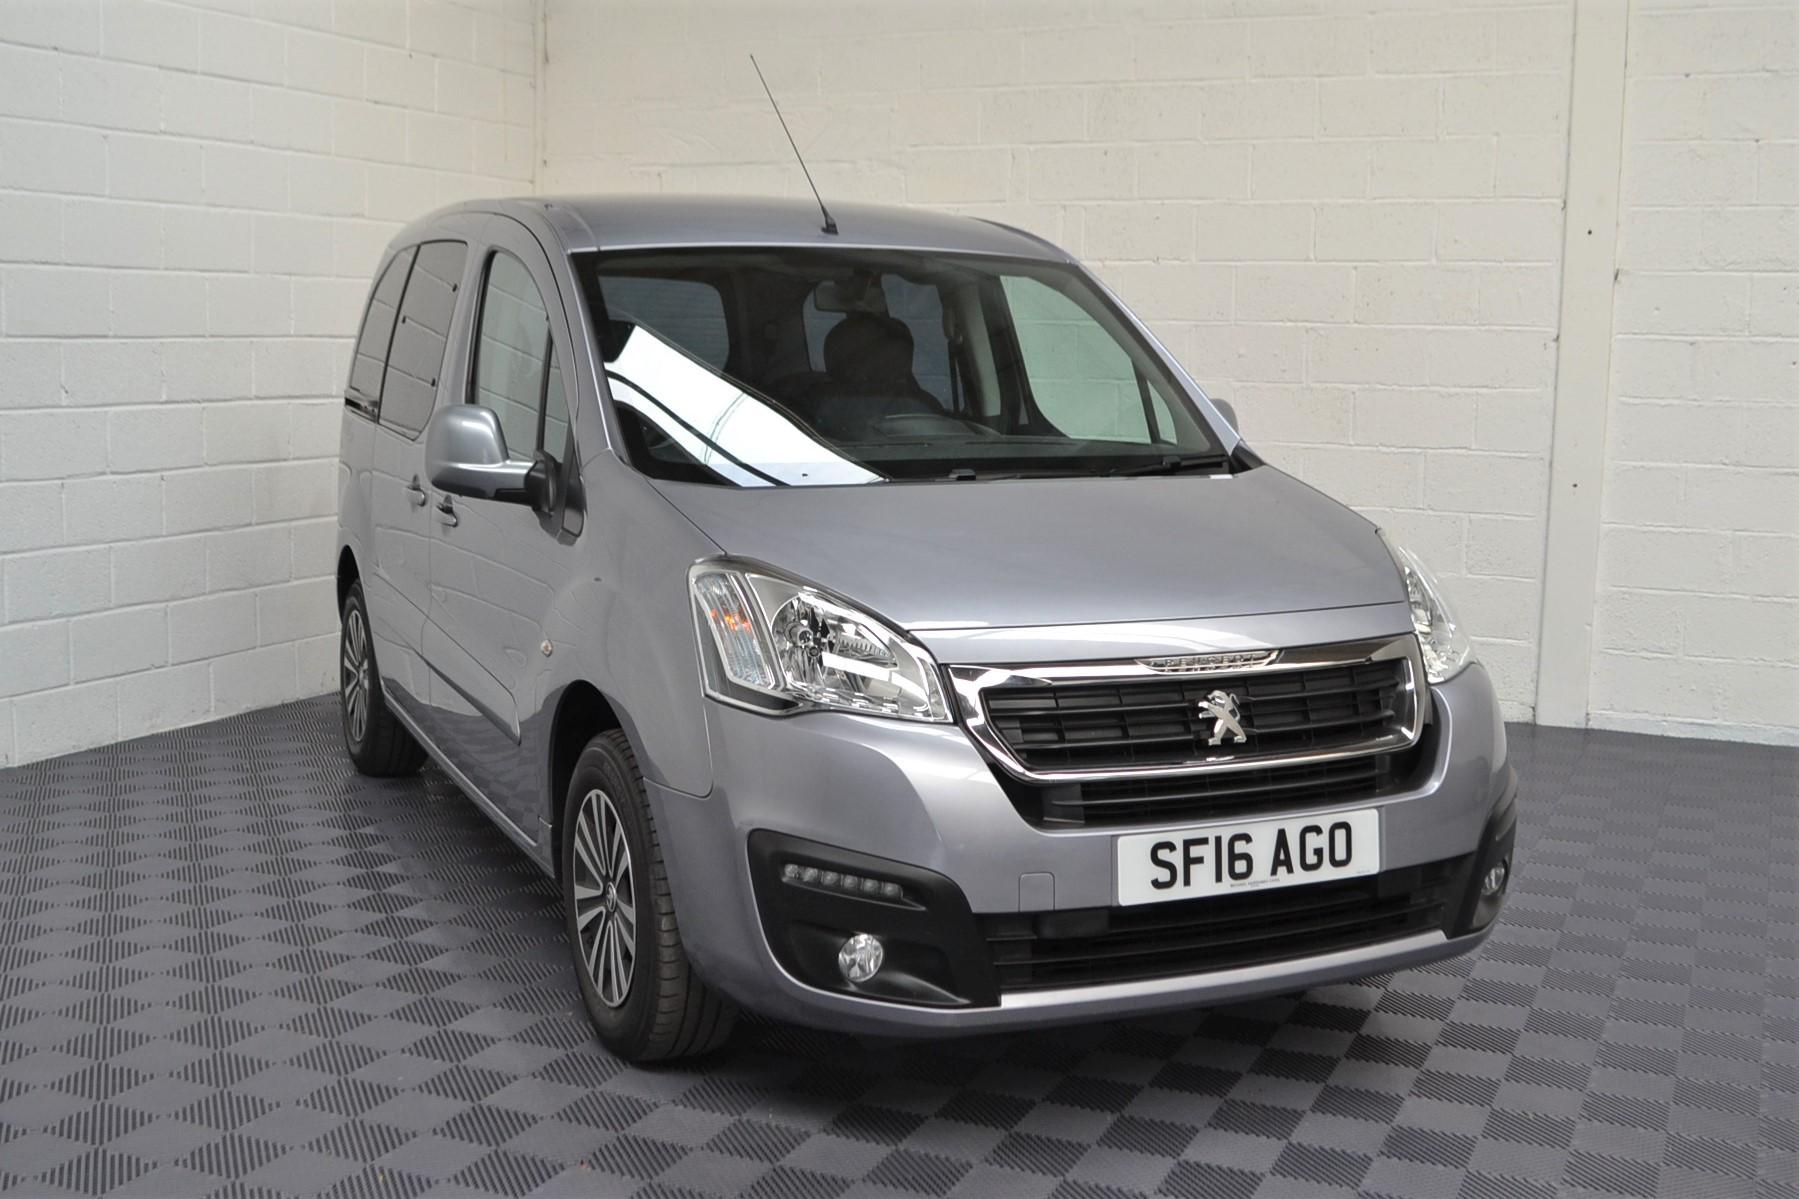 Used Wav Cars for Sale UK Citroen Berlingo WAV Car Peugeot Partner Petrol Wheelchair Accessible Vehicles Buy Sell Bristol Somerset Devon Dorset 15